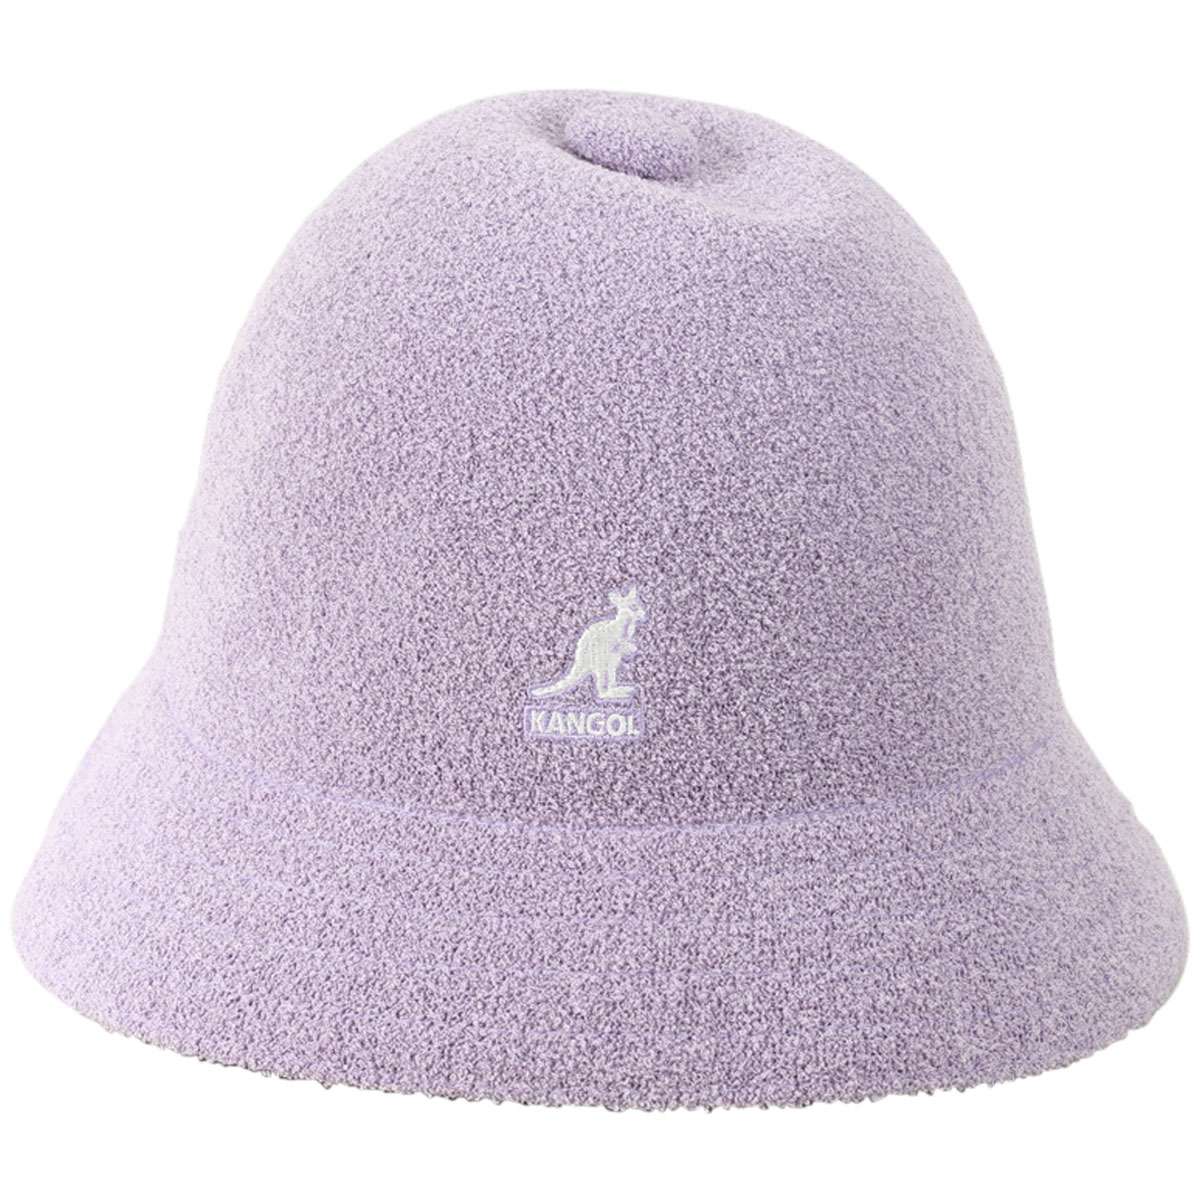 f8e555301485c5 Kangol-Men-039-s-Bermuda-Casual-Bucket-Hat thumbnail